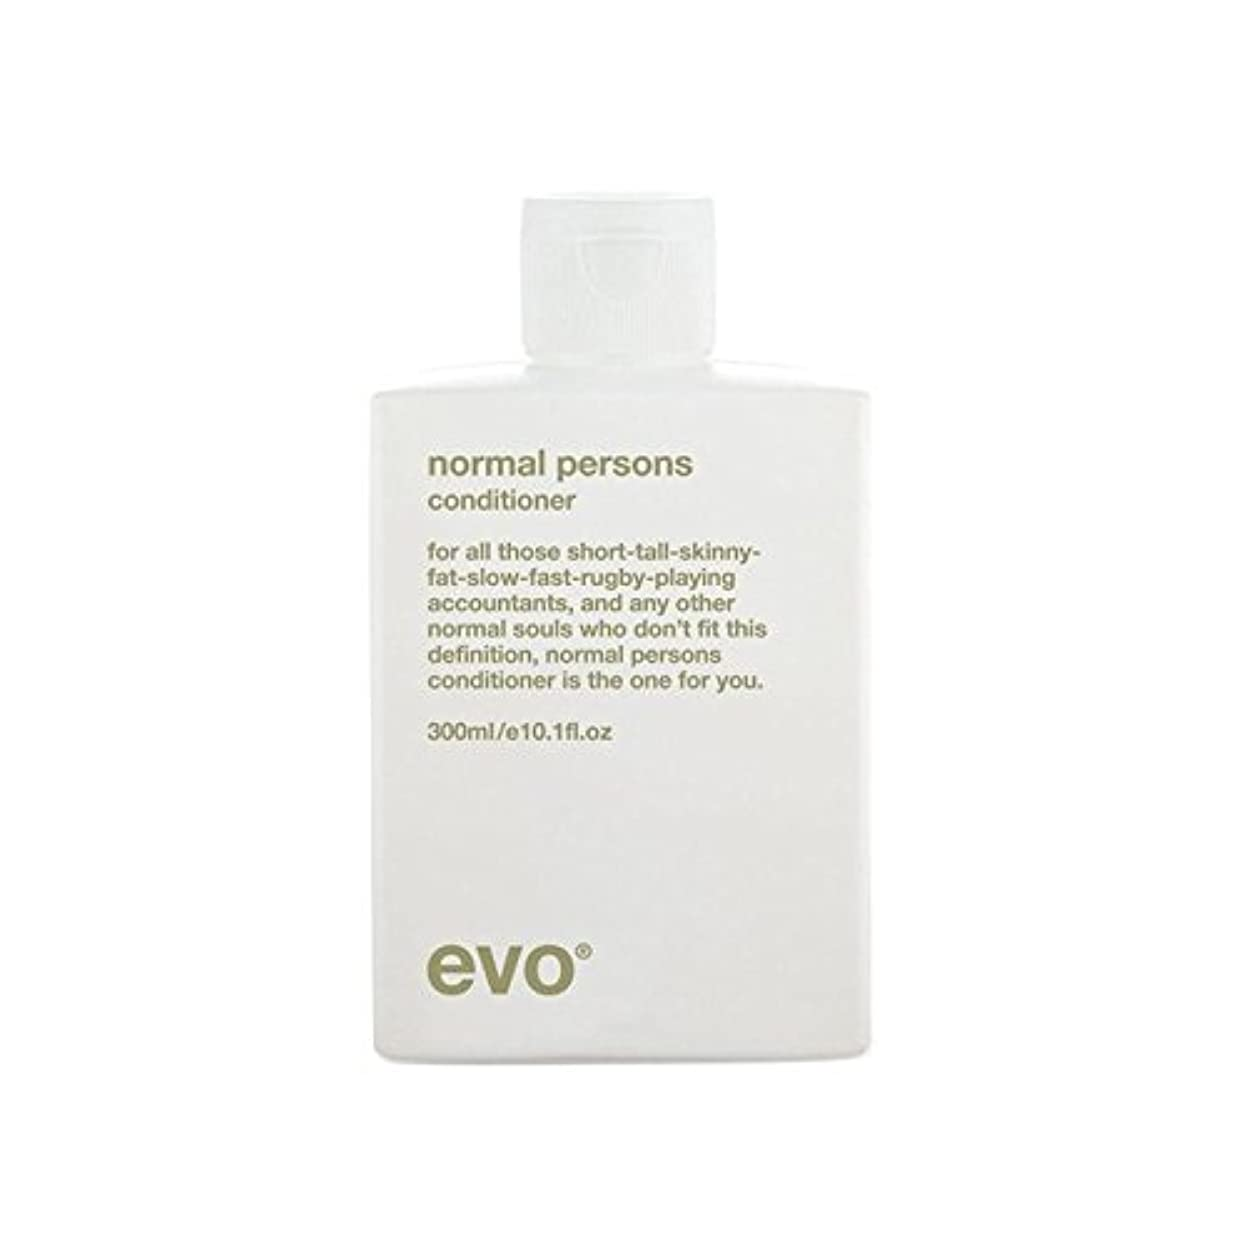 Evo Normal Persons Conditioner (300ml) - エボ正常人コンディショナー(300ミリリットル) [並行輸入品]